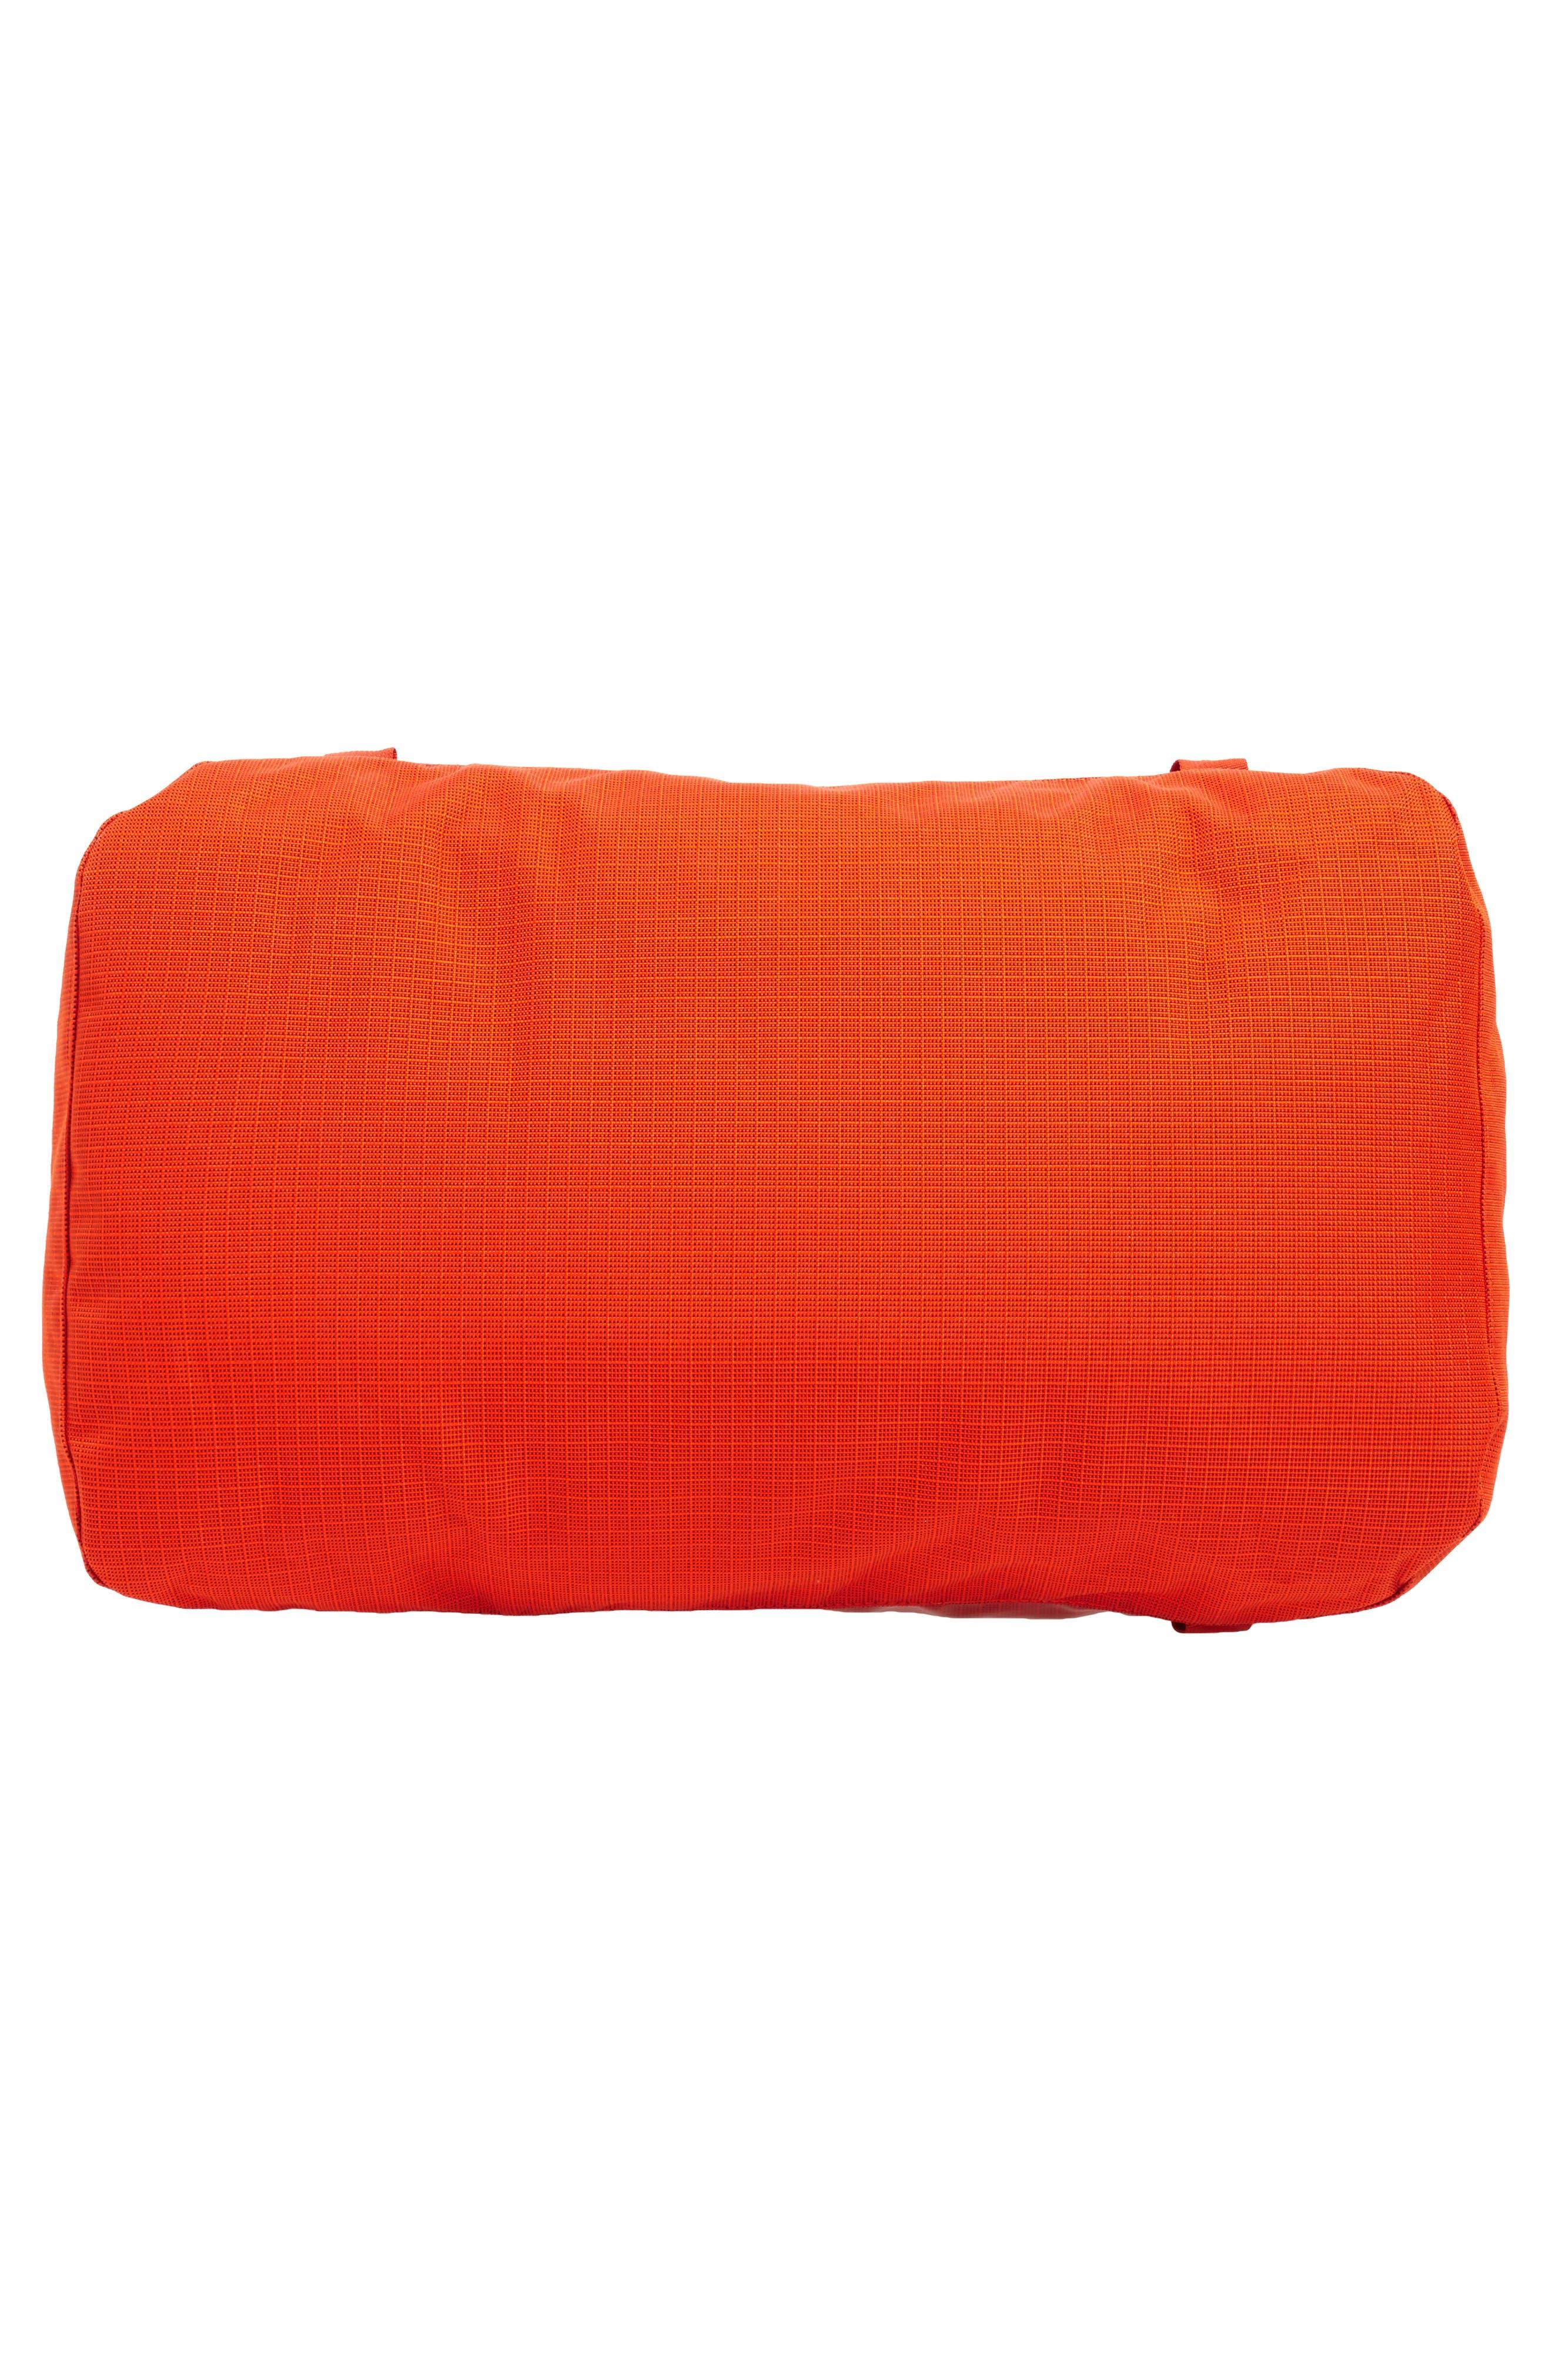 ,                             Black Hole Water Repellent 45-Liter Duffle Bag,                             Alternate thumbnail 64, color,                             600